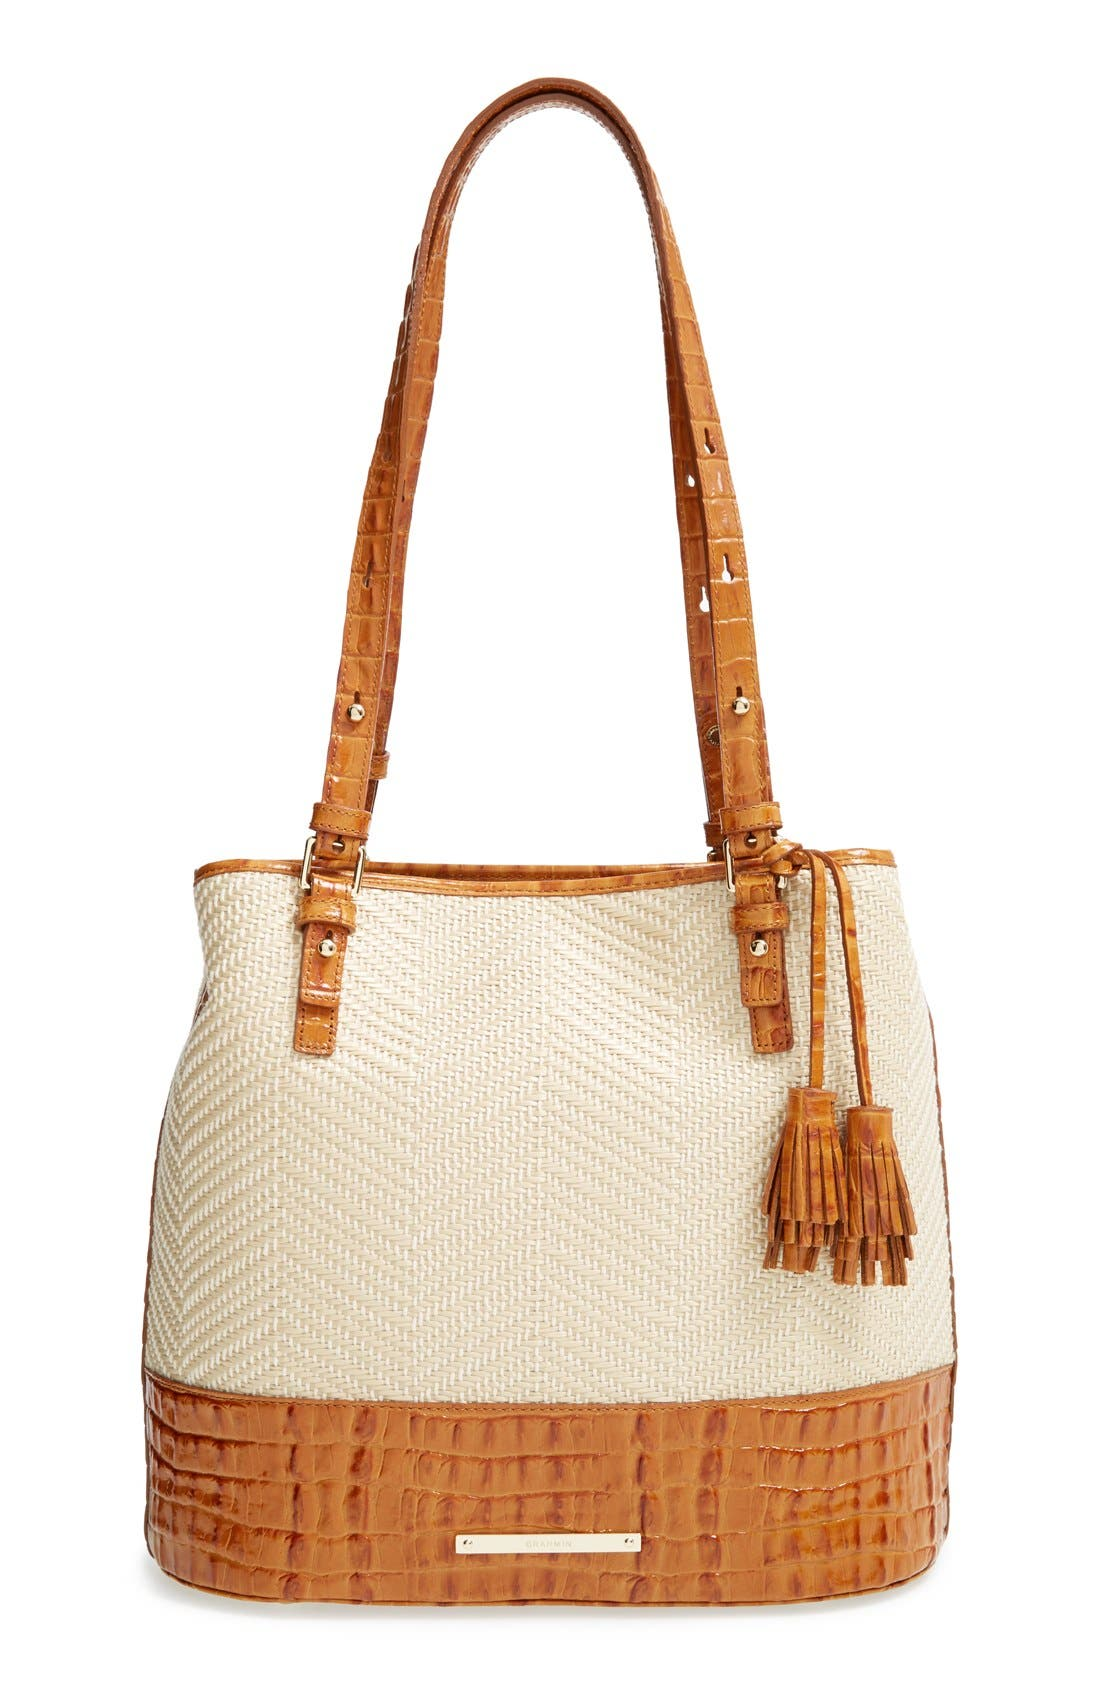 'Hudson' Leather & Raffia Bucket Bag,                             Main thumbnail 1, color,                             250